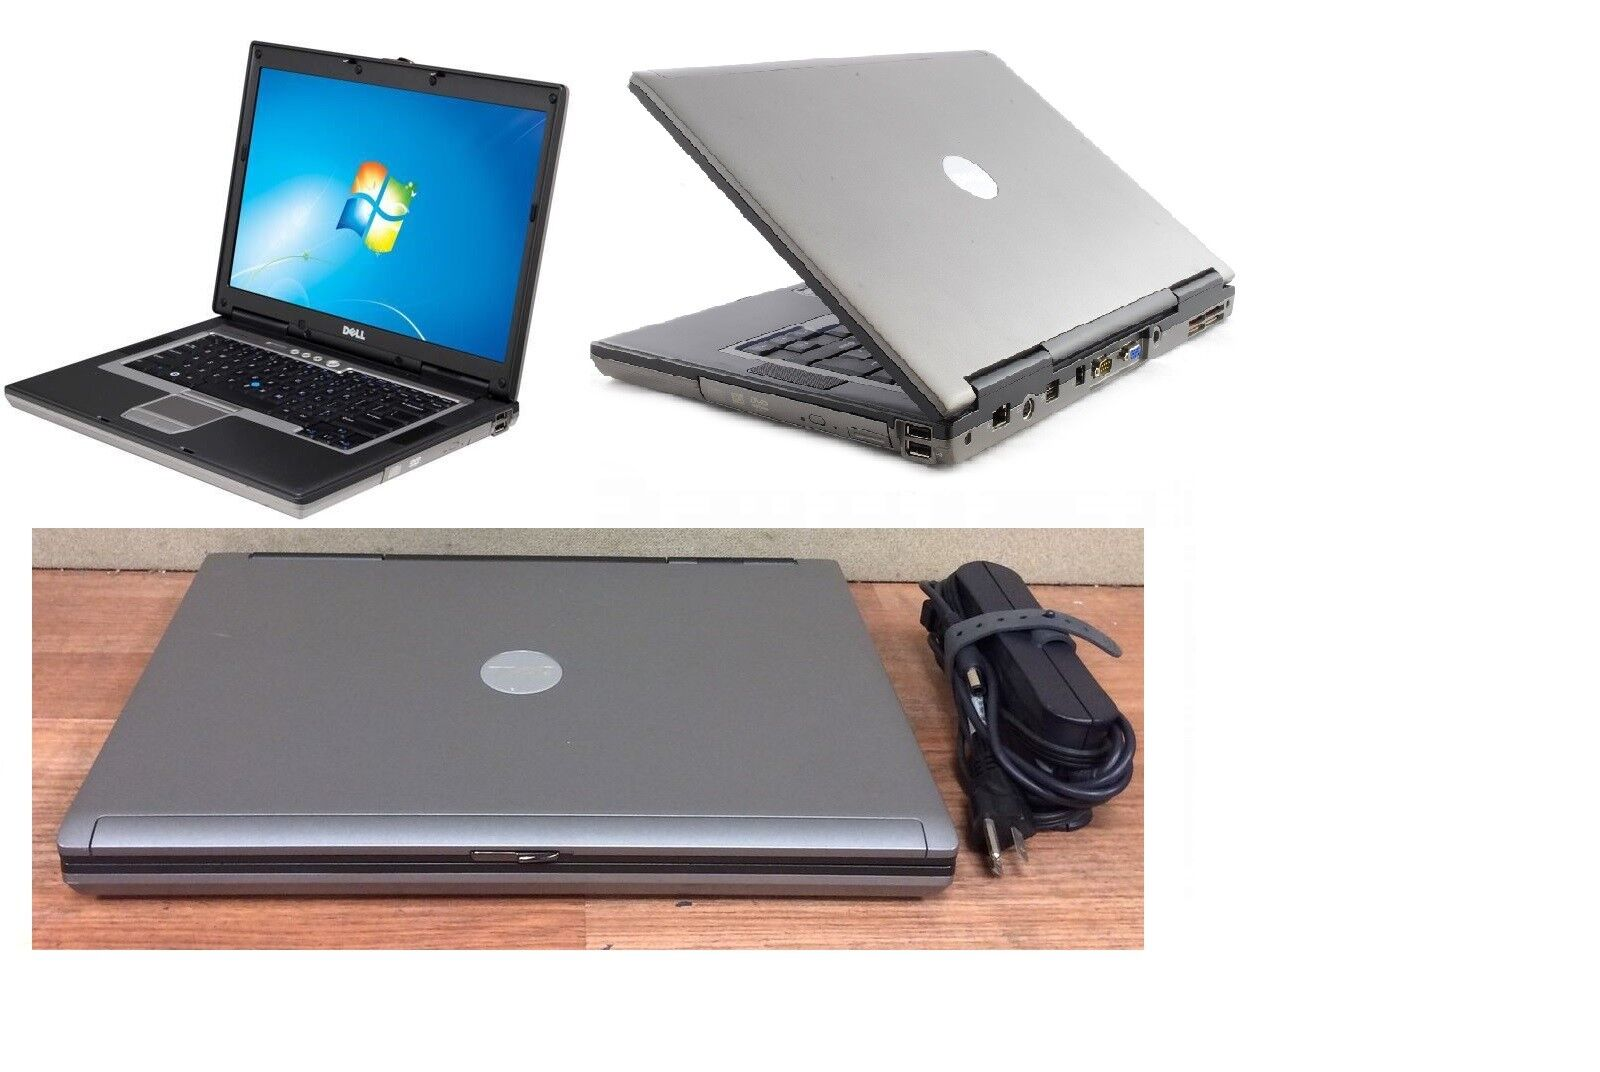 "Dell Latitude LAPTOP/NOTEBOOK 15.4"" Screen+300GB Windows 7 PRO WIFI+Word program"